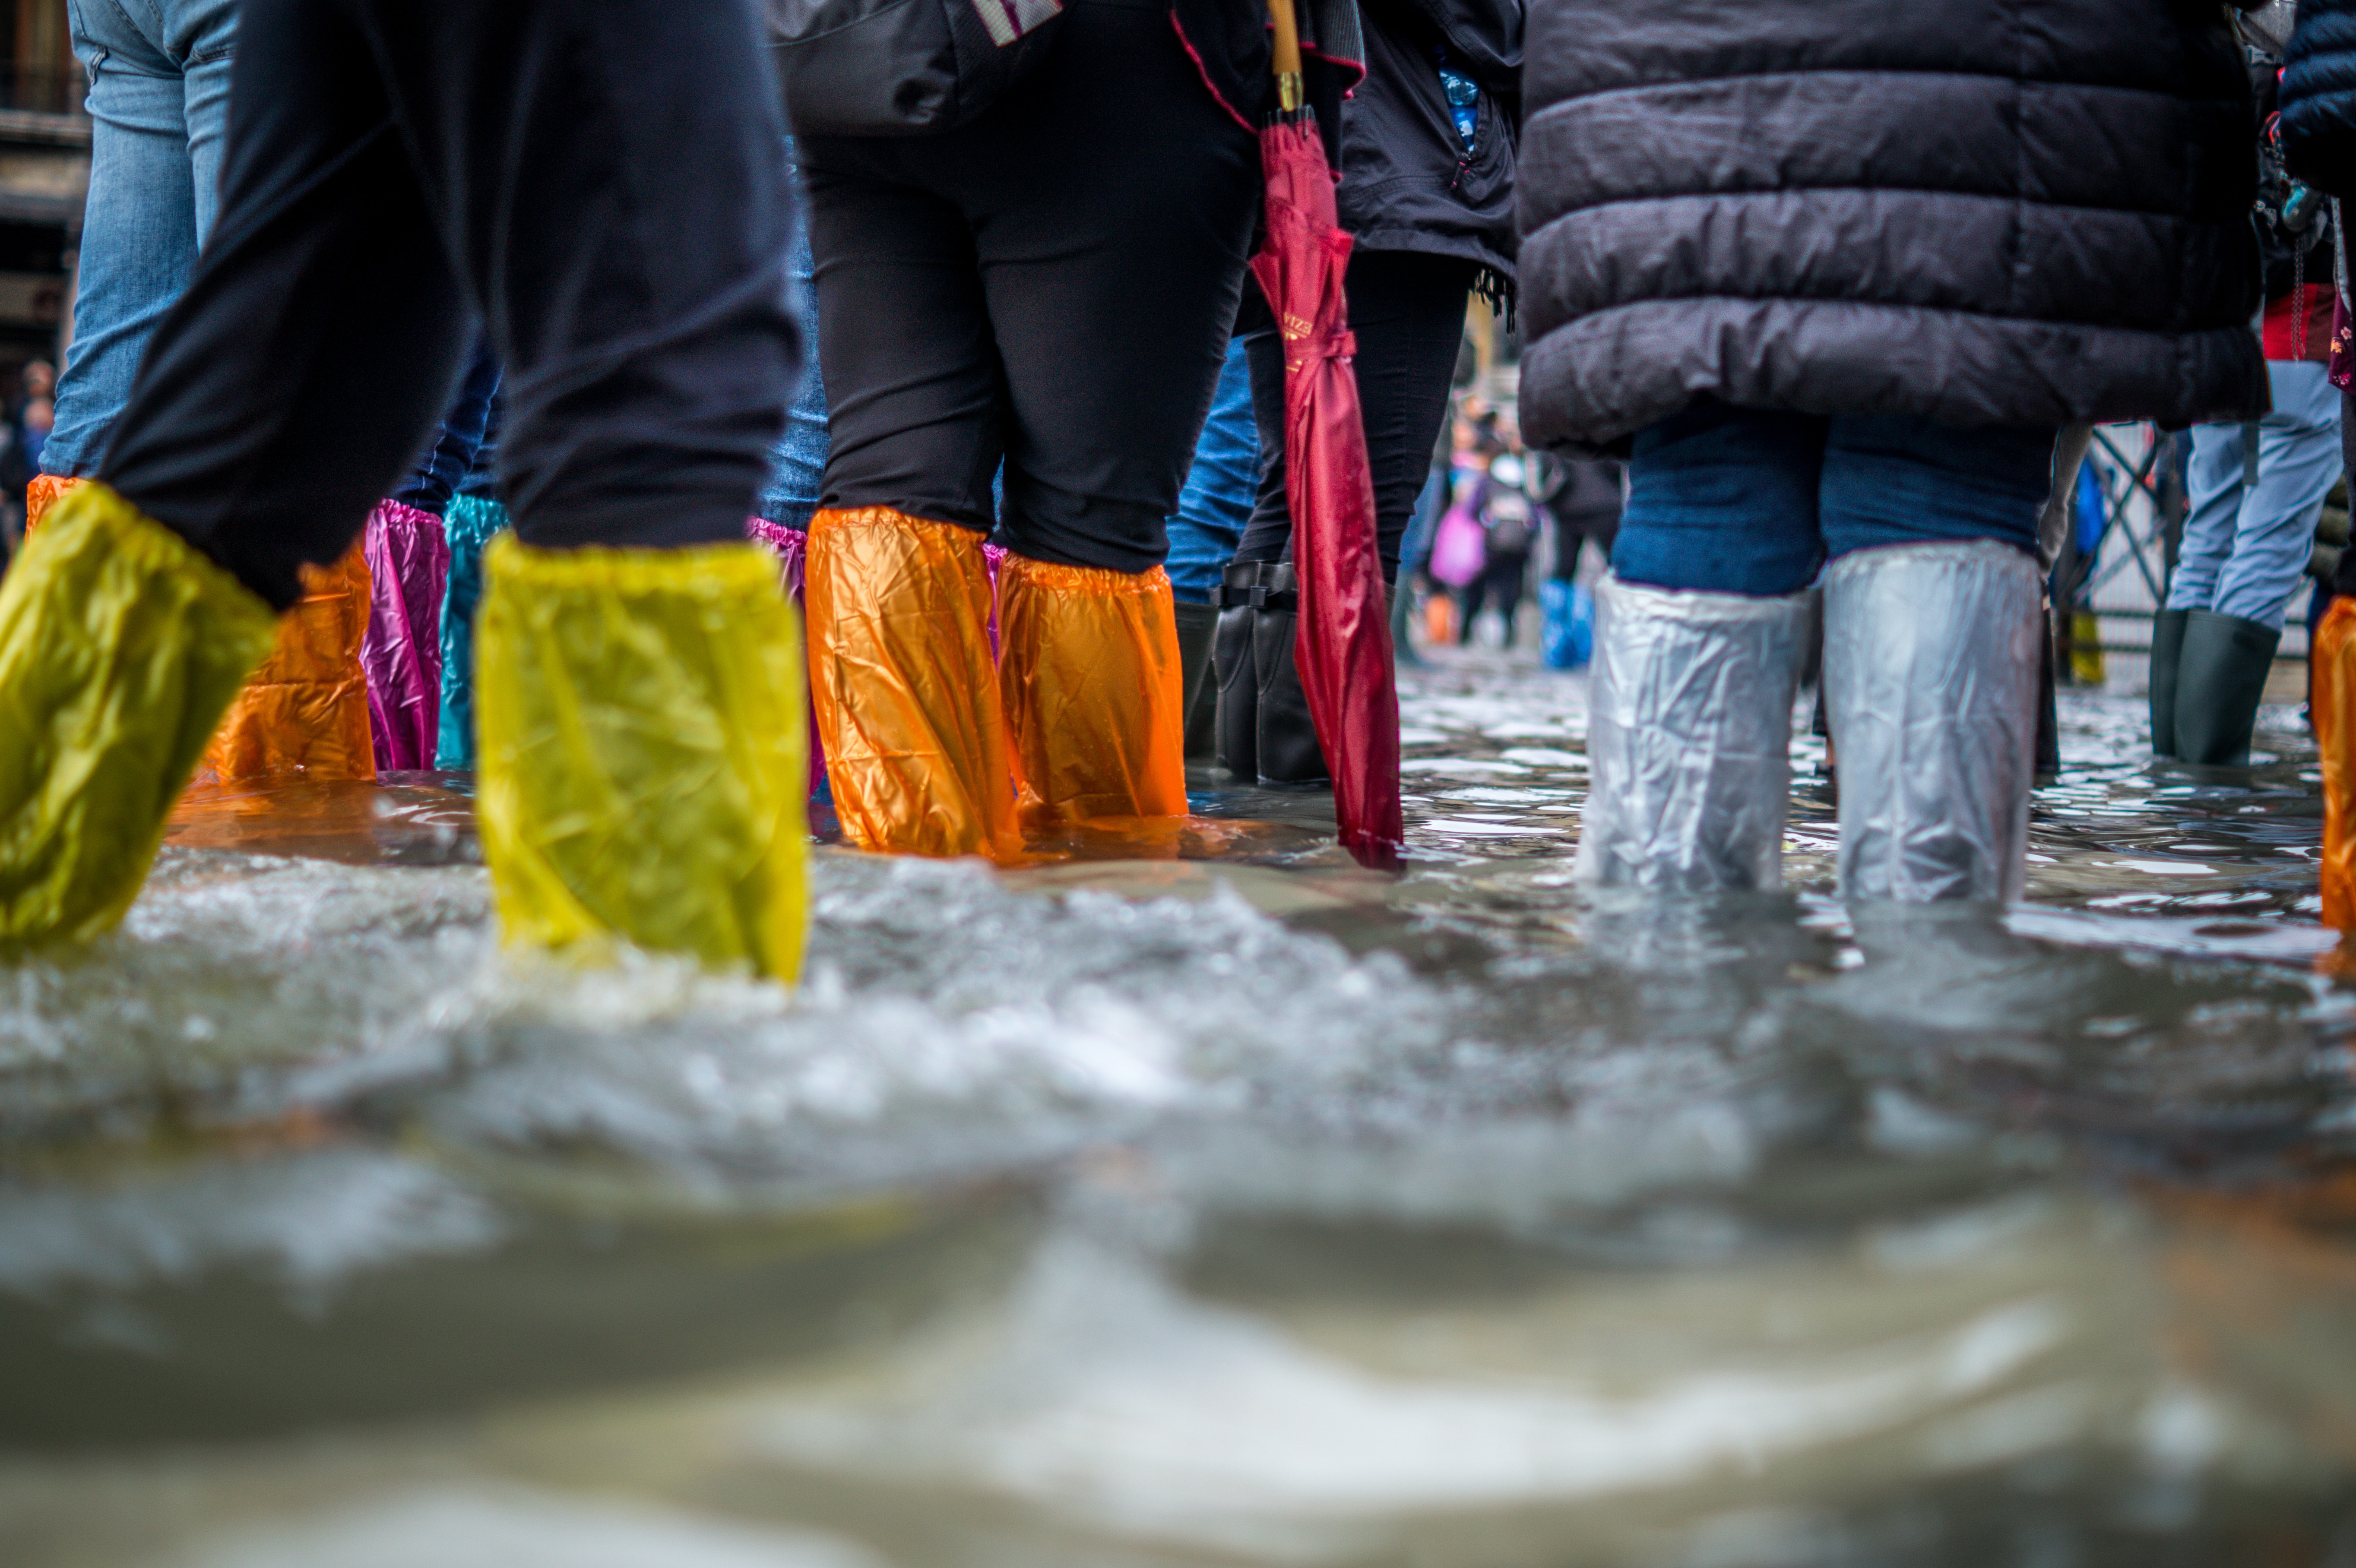 Queensland's emergency flood threat passed